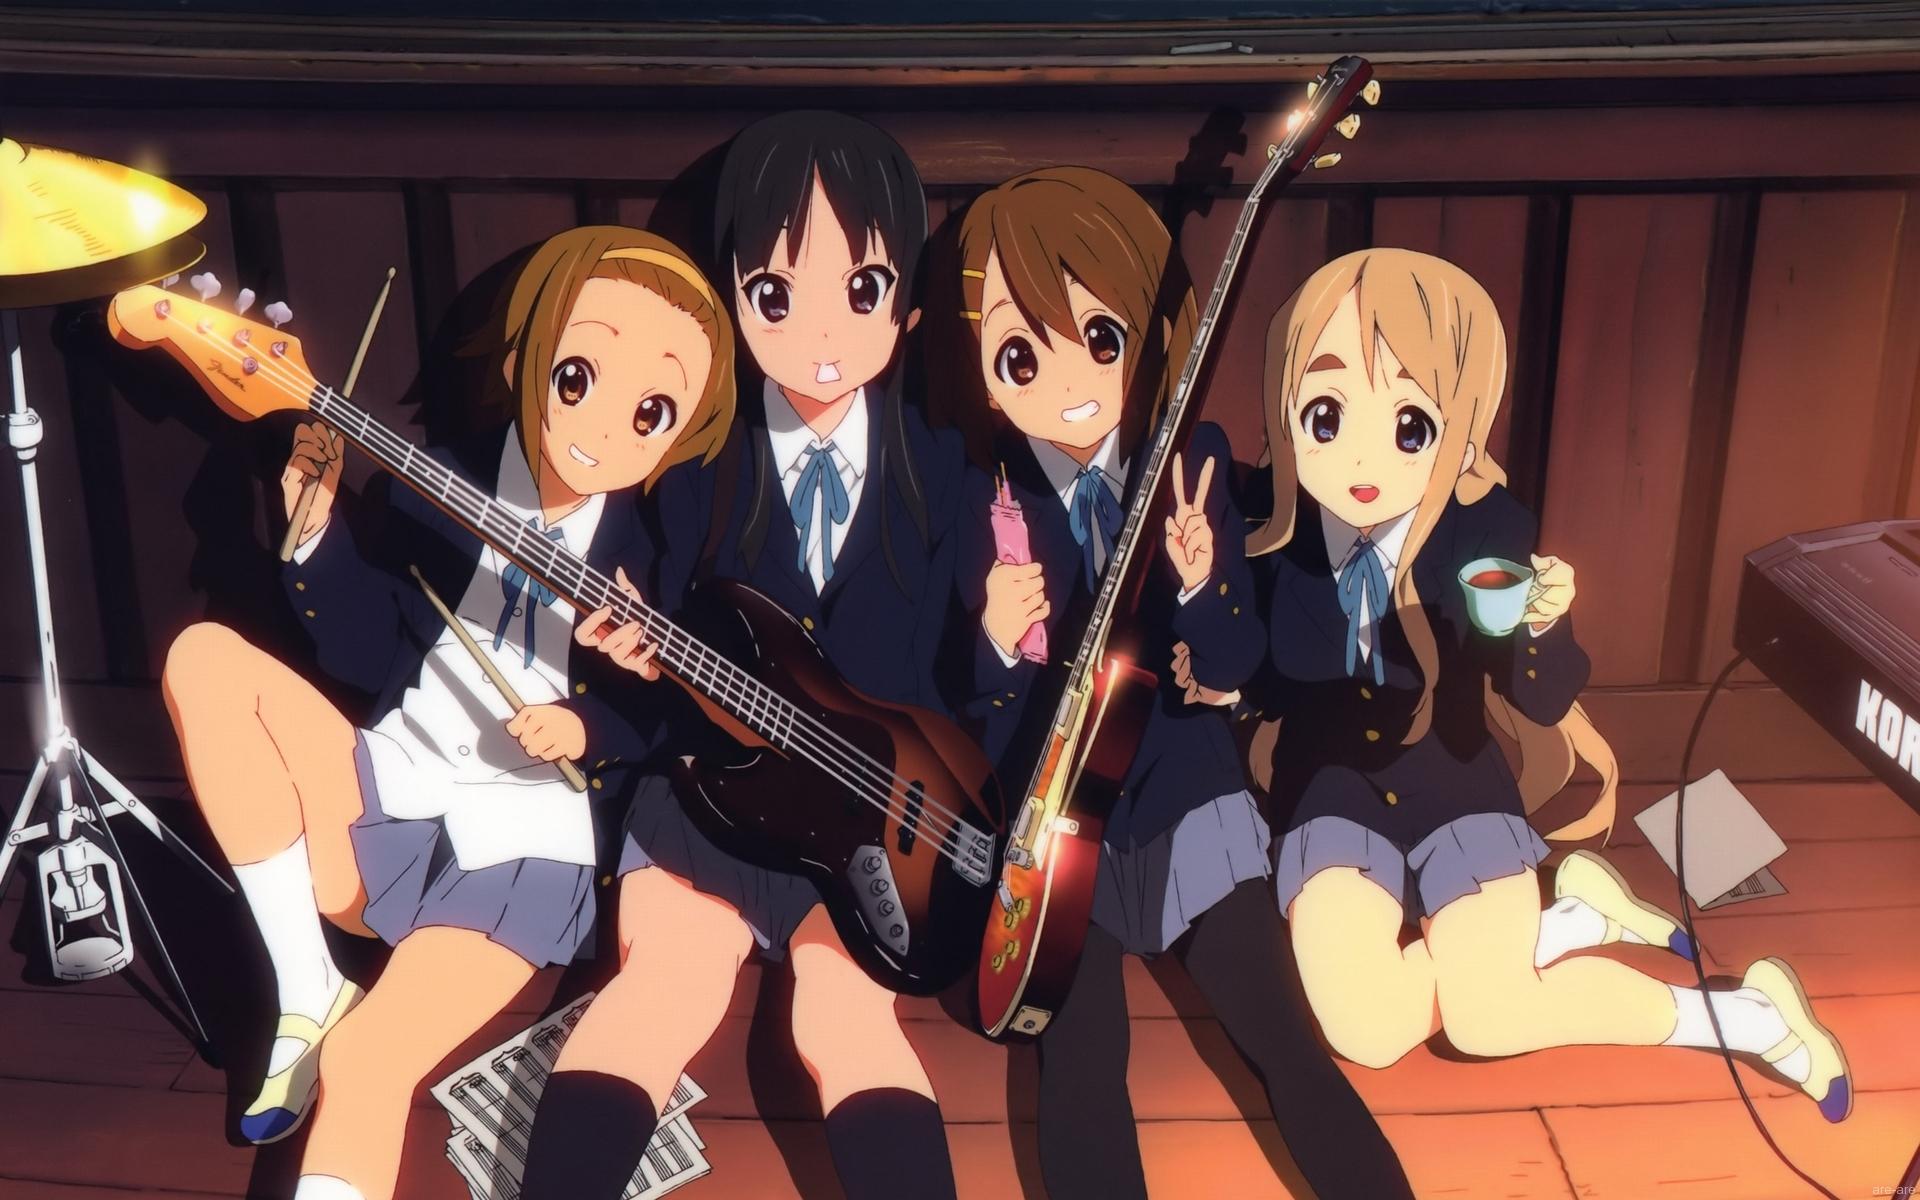 anime music images k - photo #1